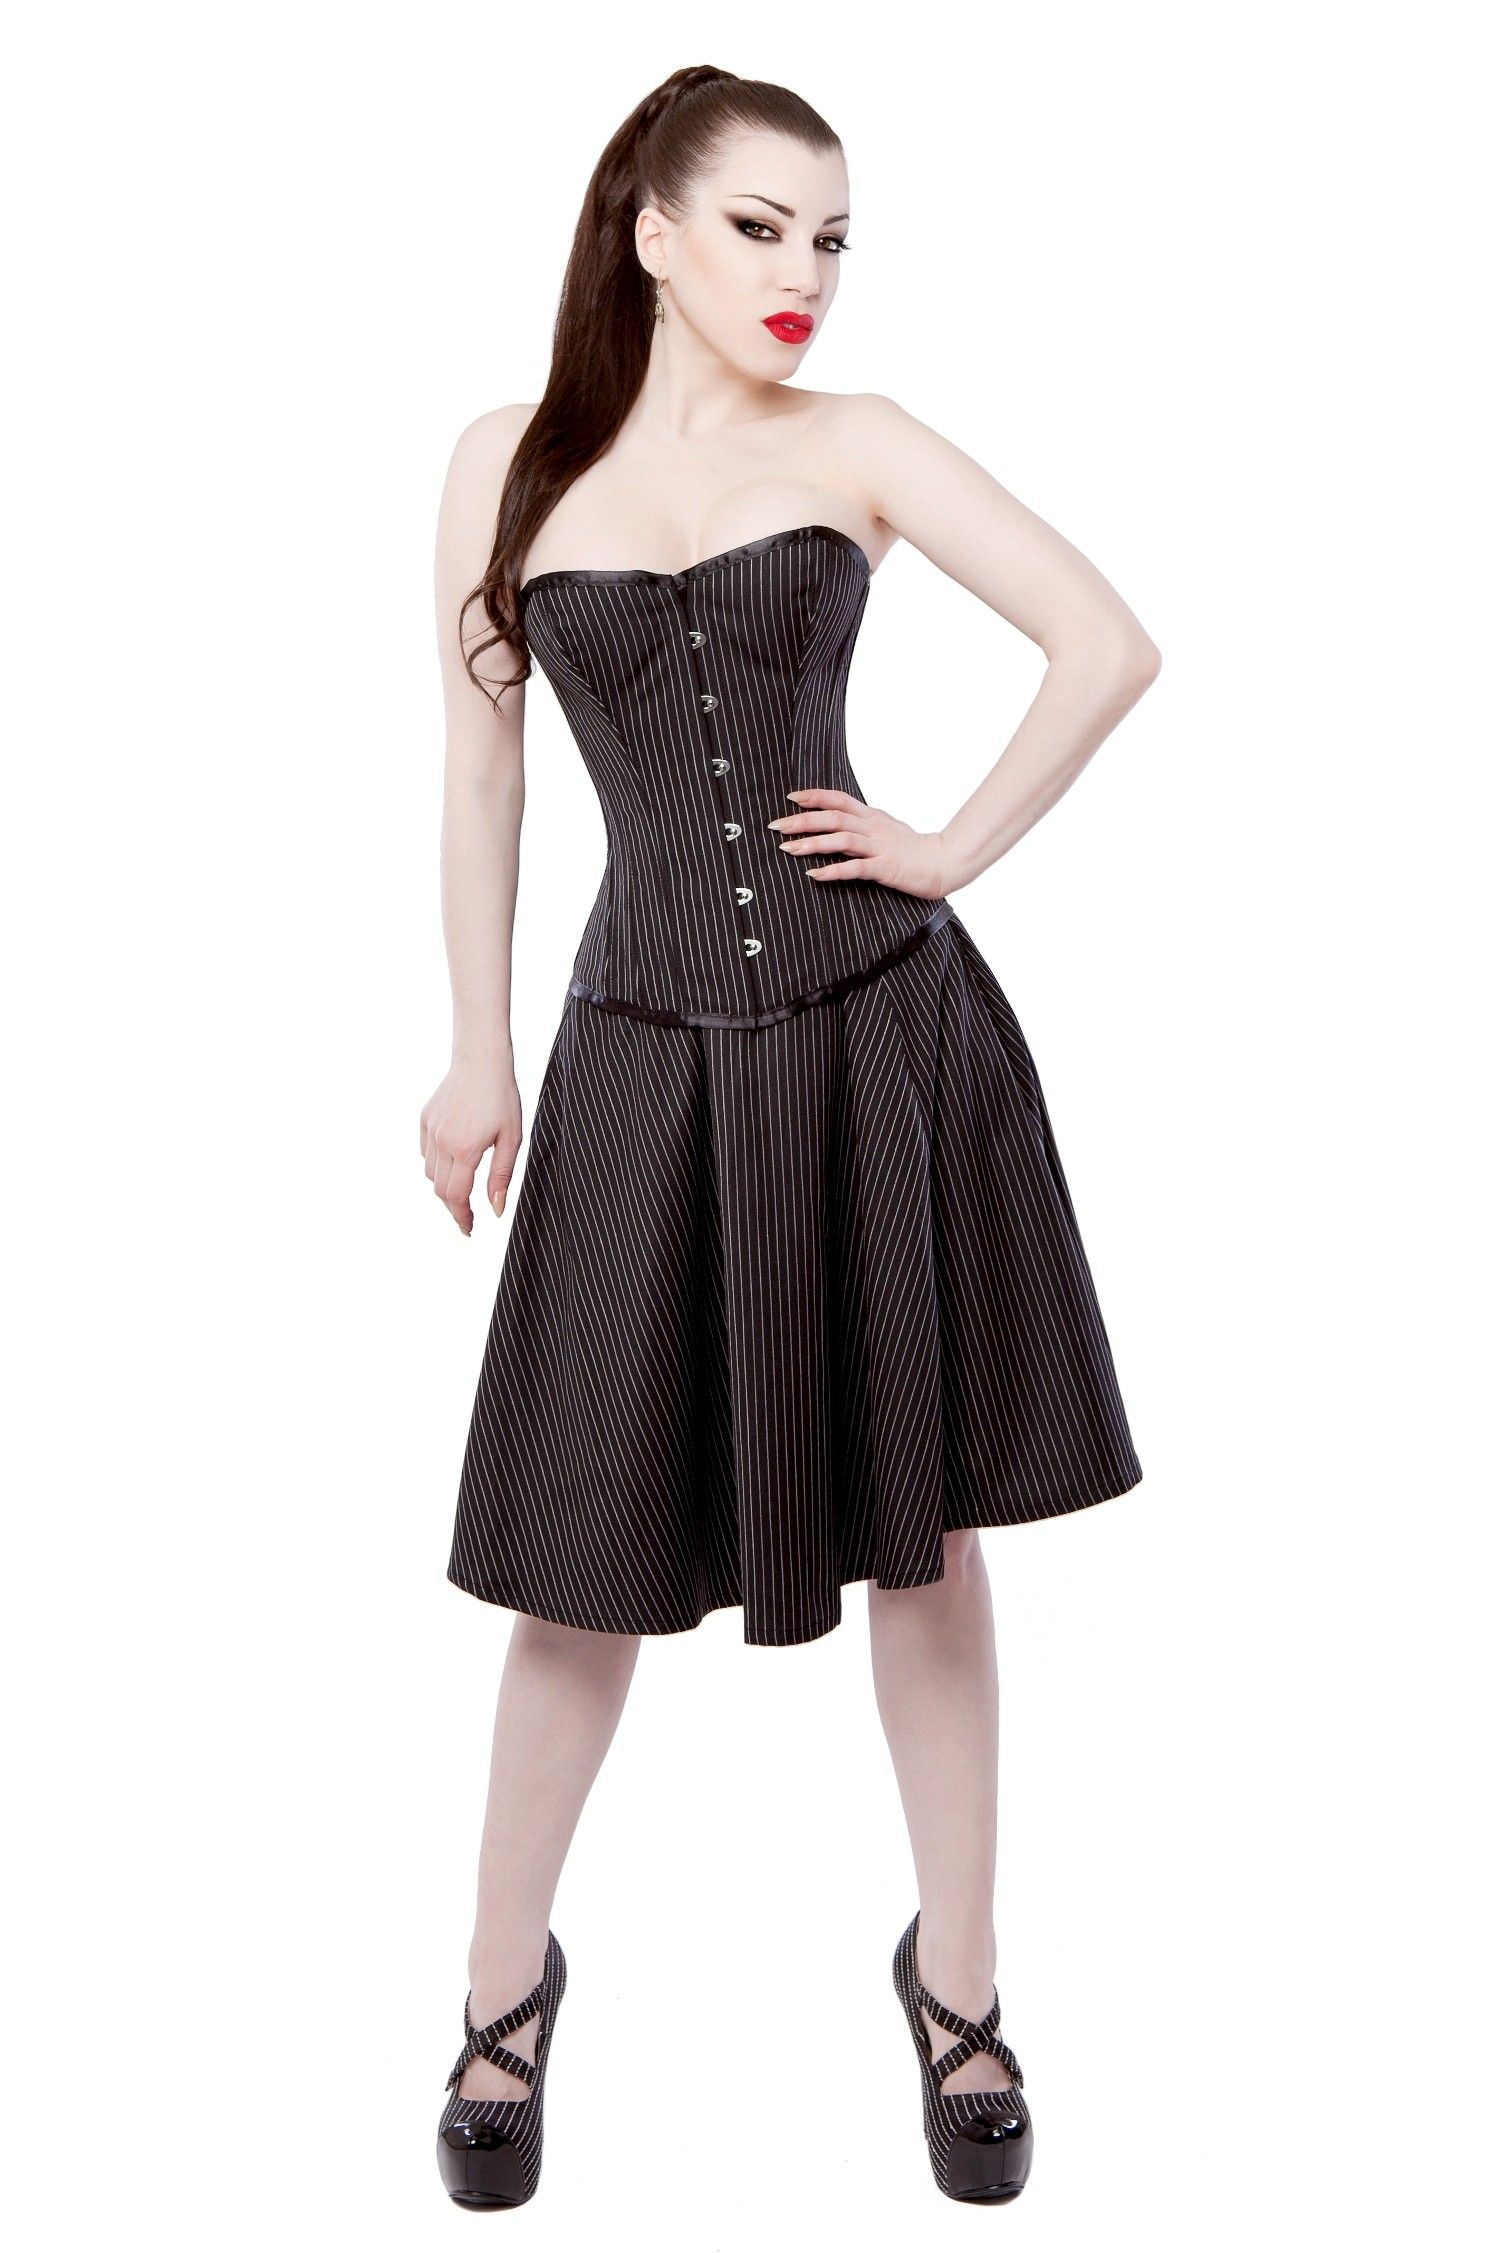 022a7a538de Pinstripe Corset Dress   Shoes